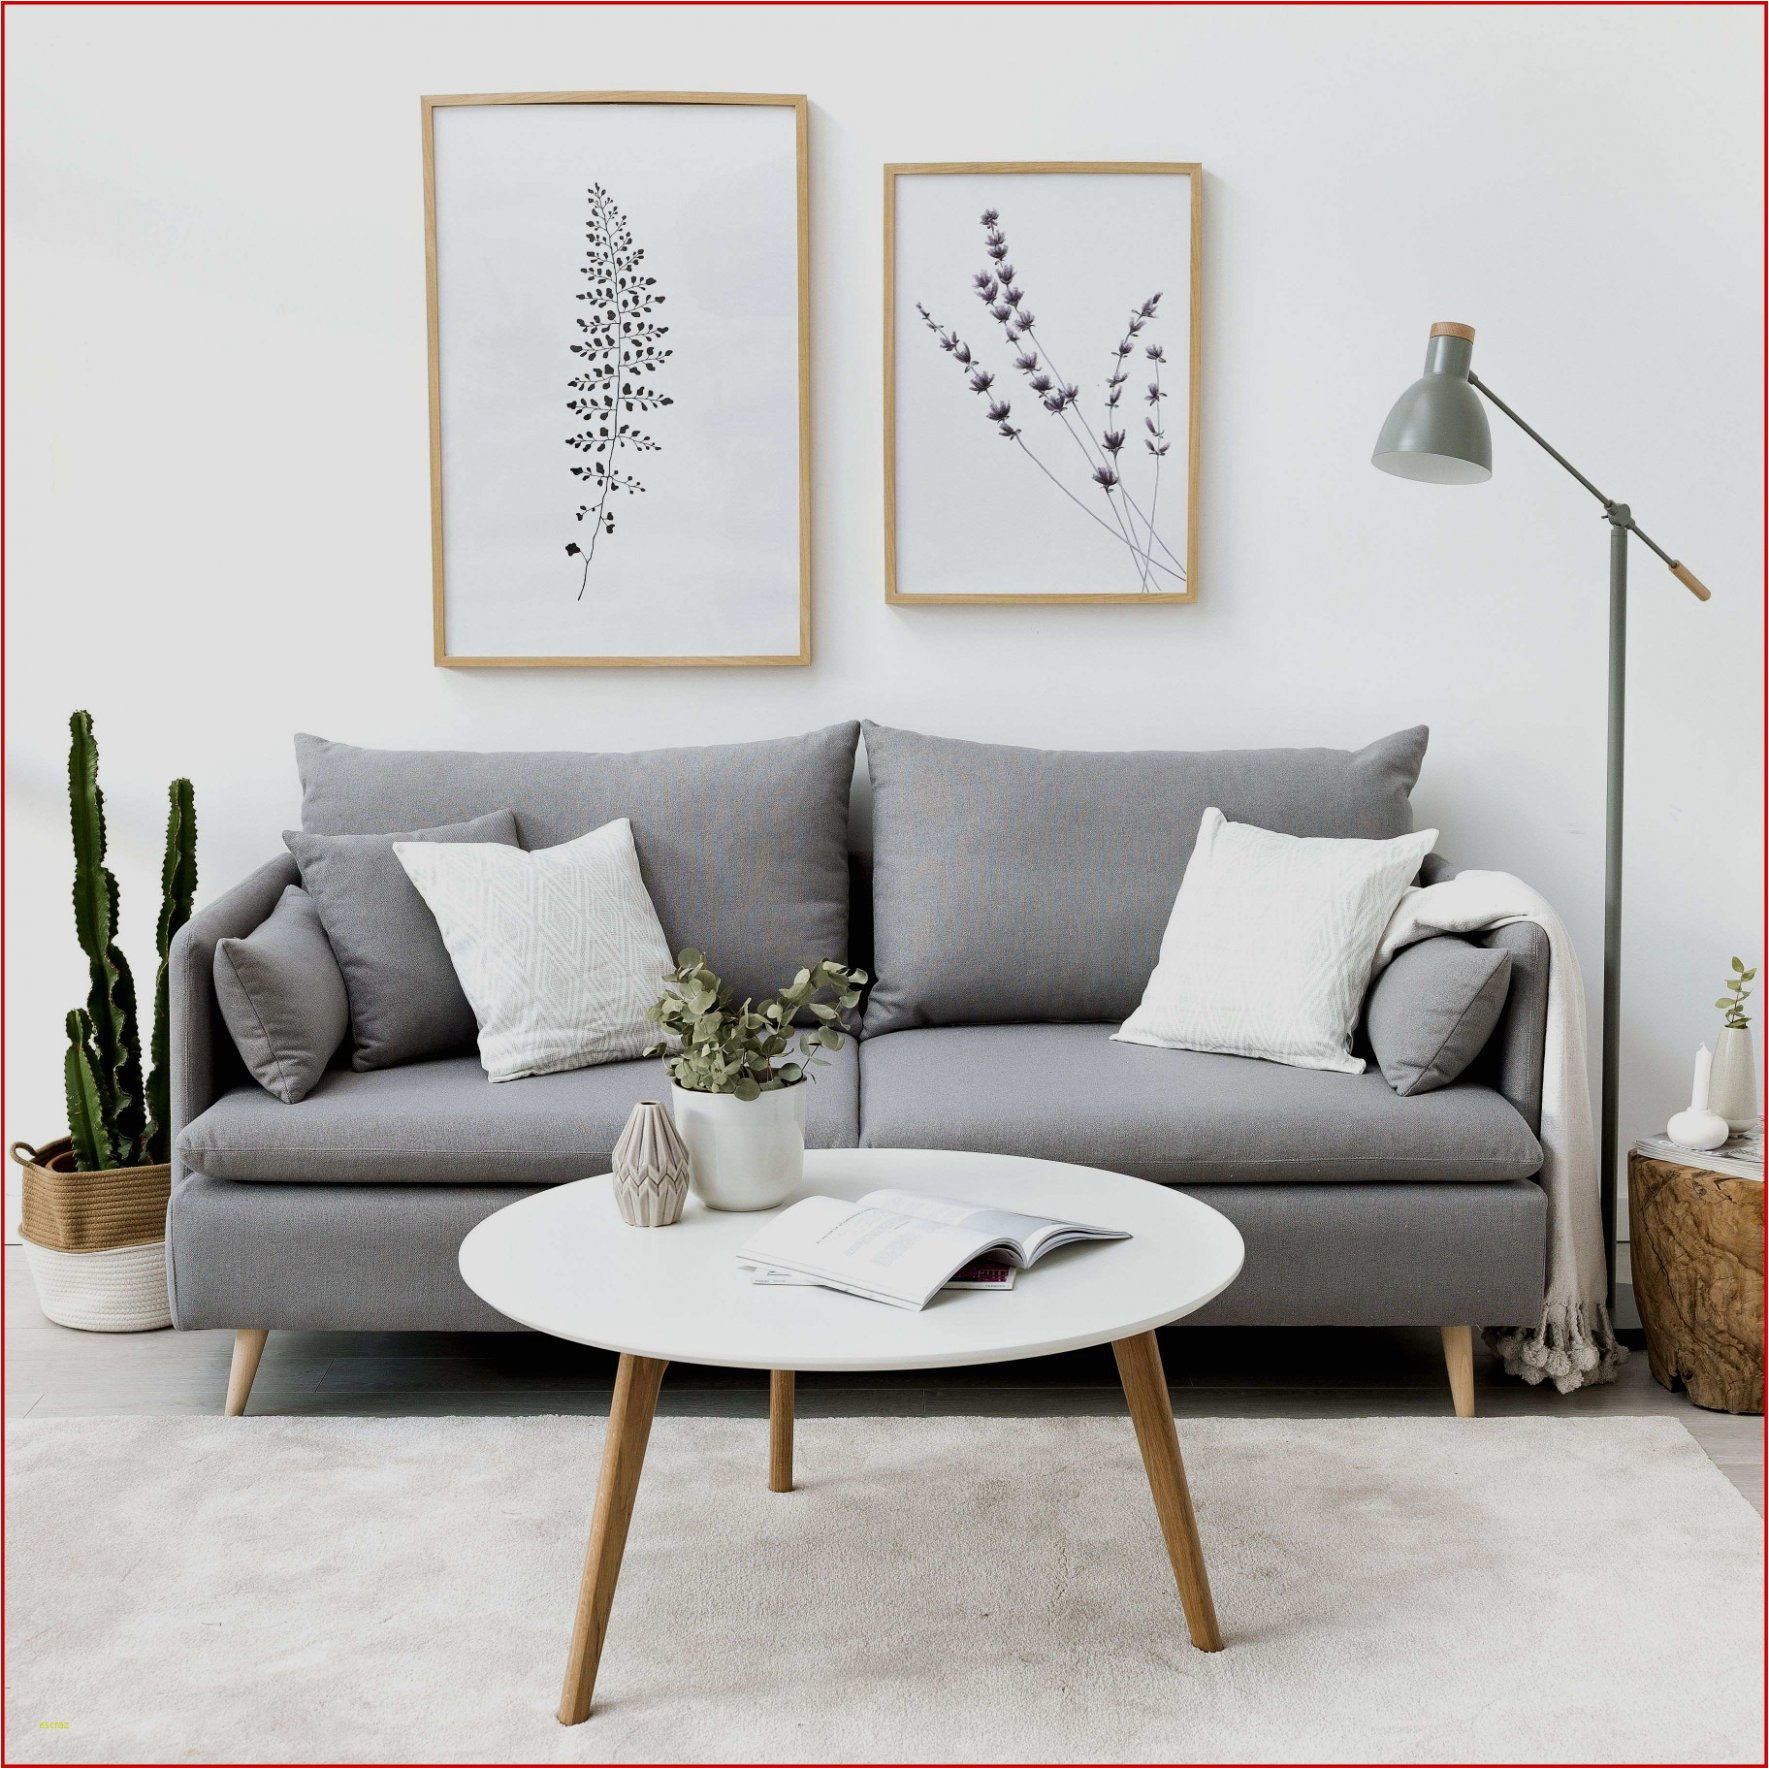 mueblerias baratas en houston tx sofas baratos ikea busco sillas adinaporter. Black Bedroom Furniture Sets. Home Design Ideas